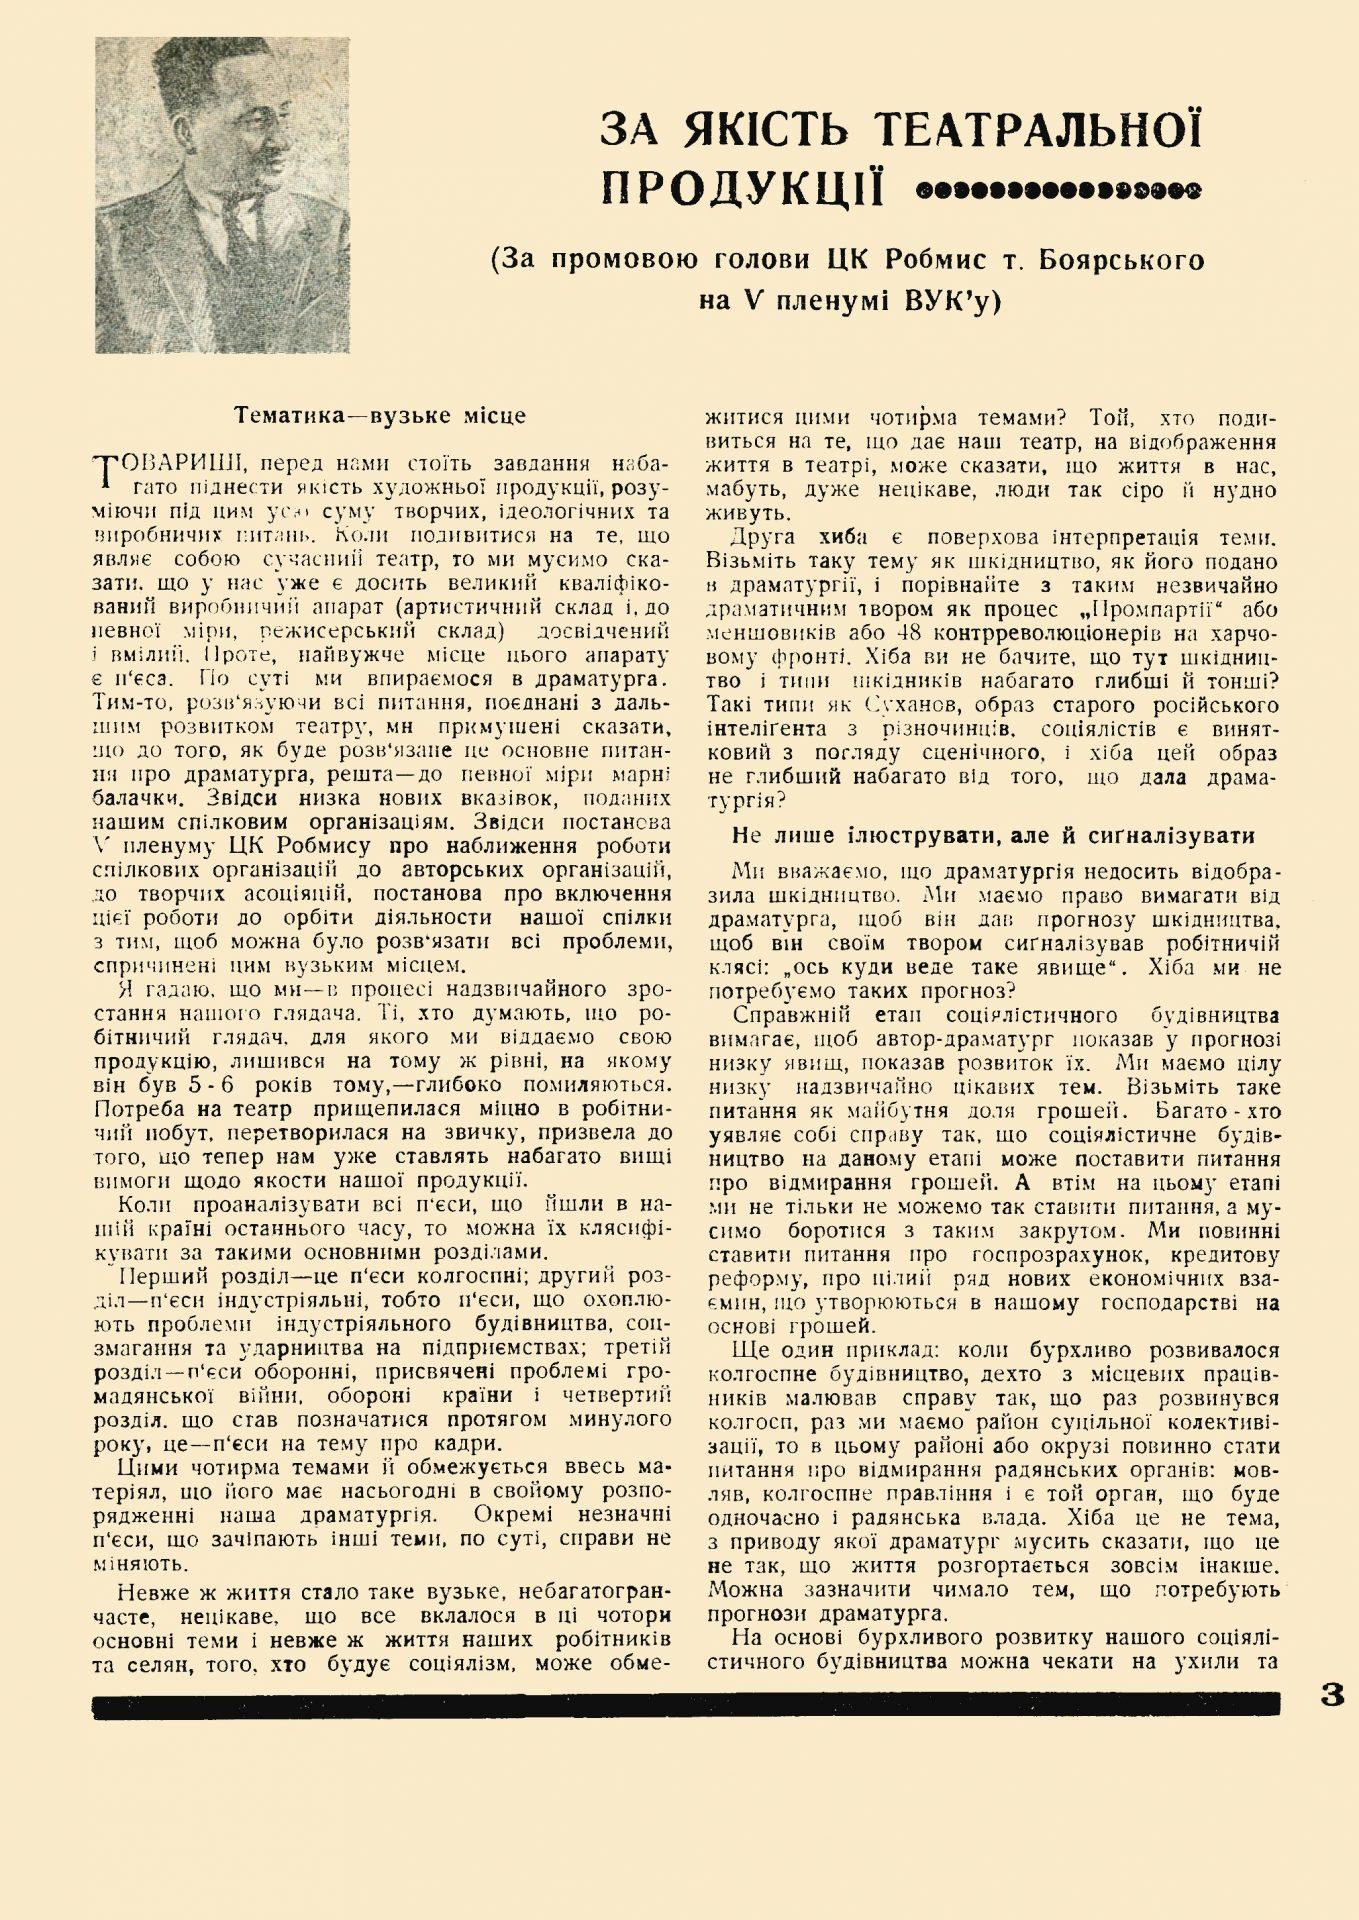 Мистецька трибуна_1931_№10-11